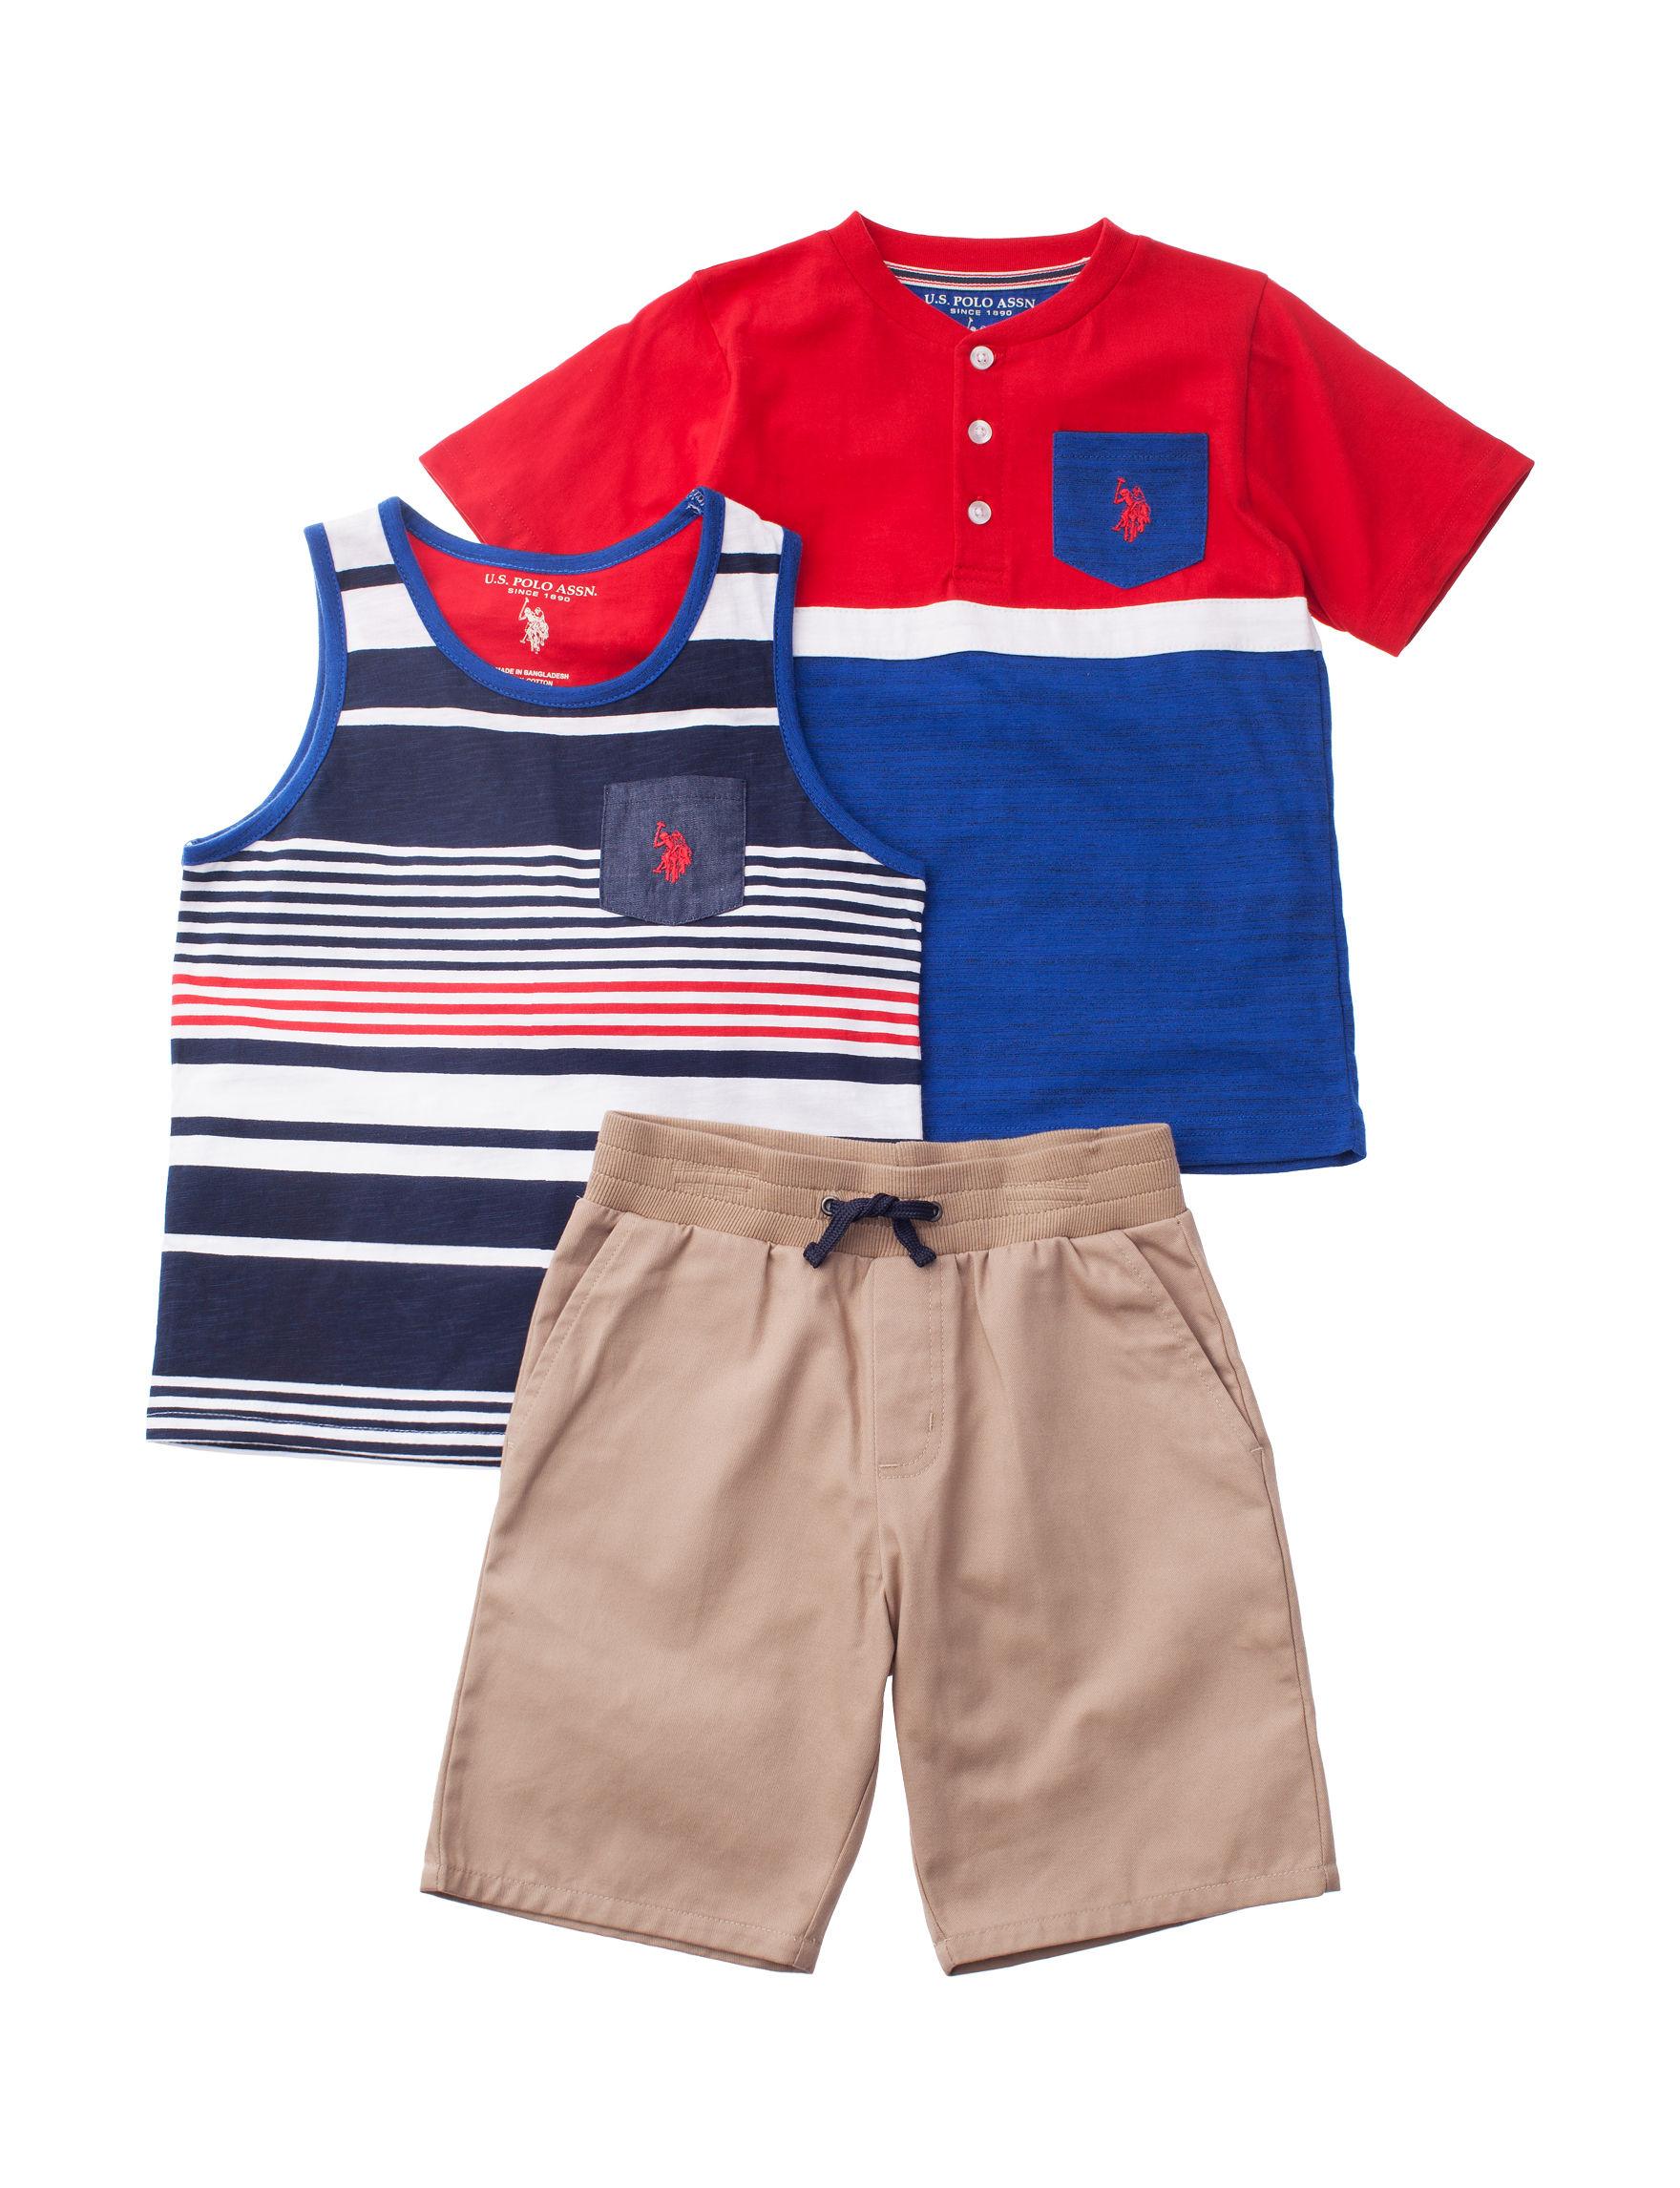 U.S. Polo Assn. Red / White / Blue